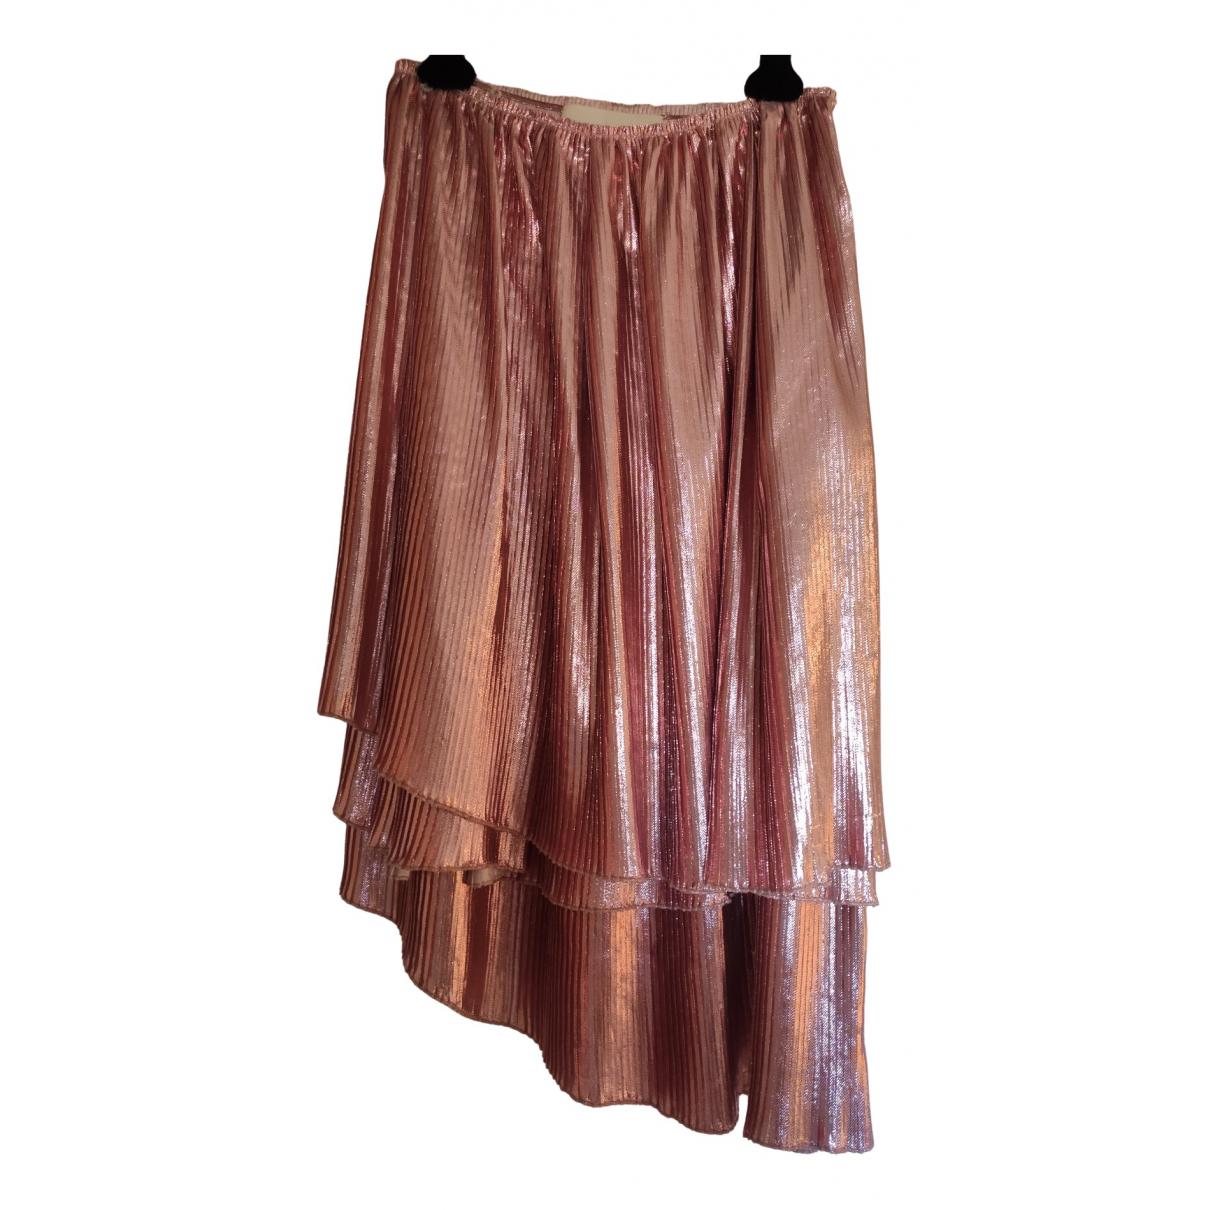 Cédric Charlier \N Pink skirt for Women 40 IT